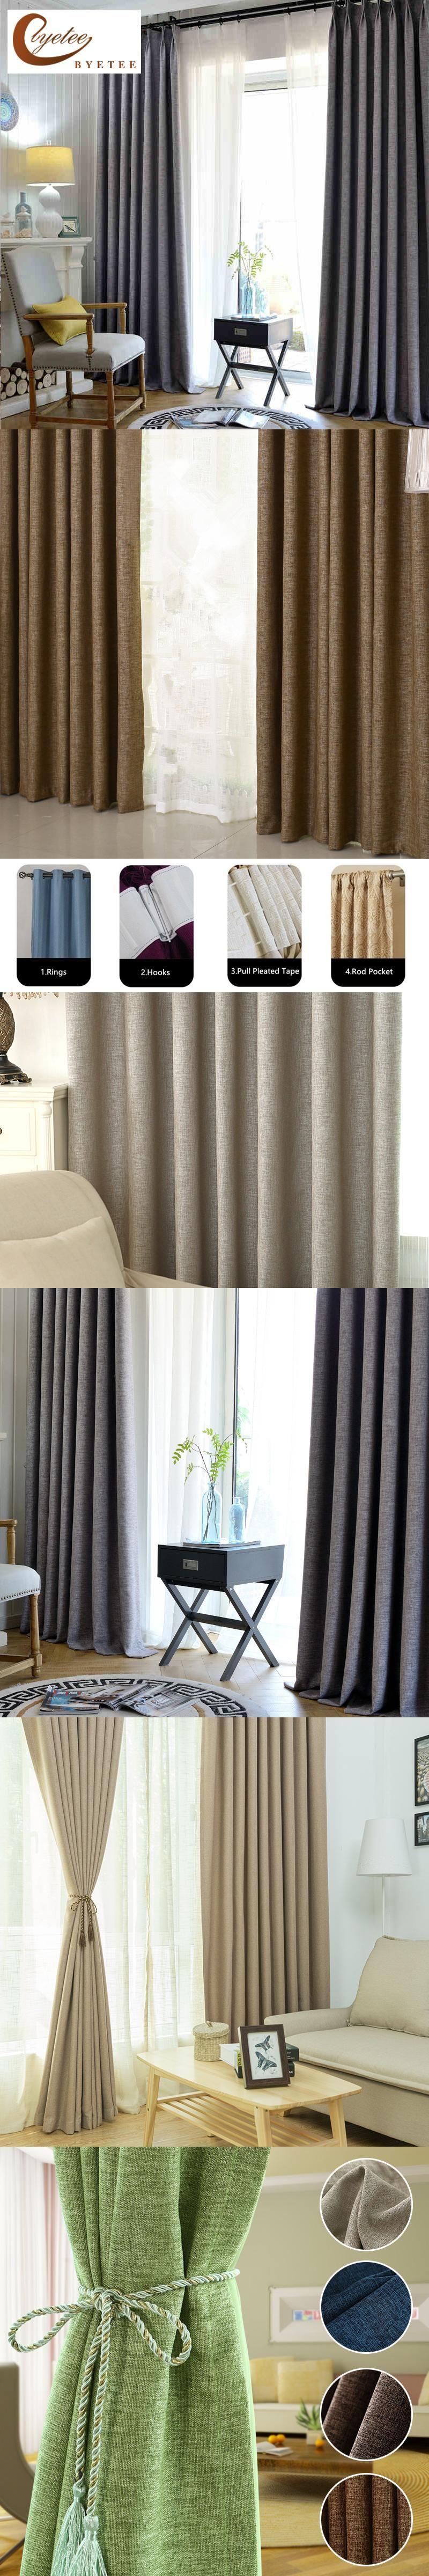 3 window bedroom curtains  byetee blackout linen cotton linen modern curtain fabric curtain